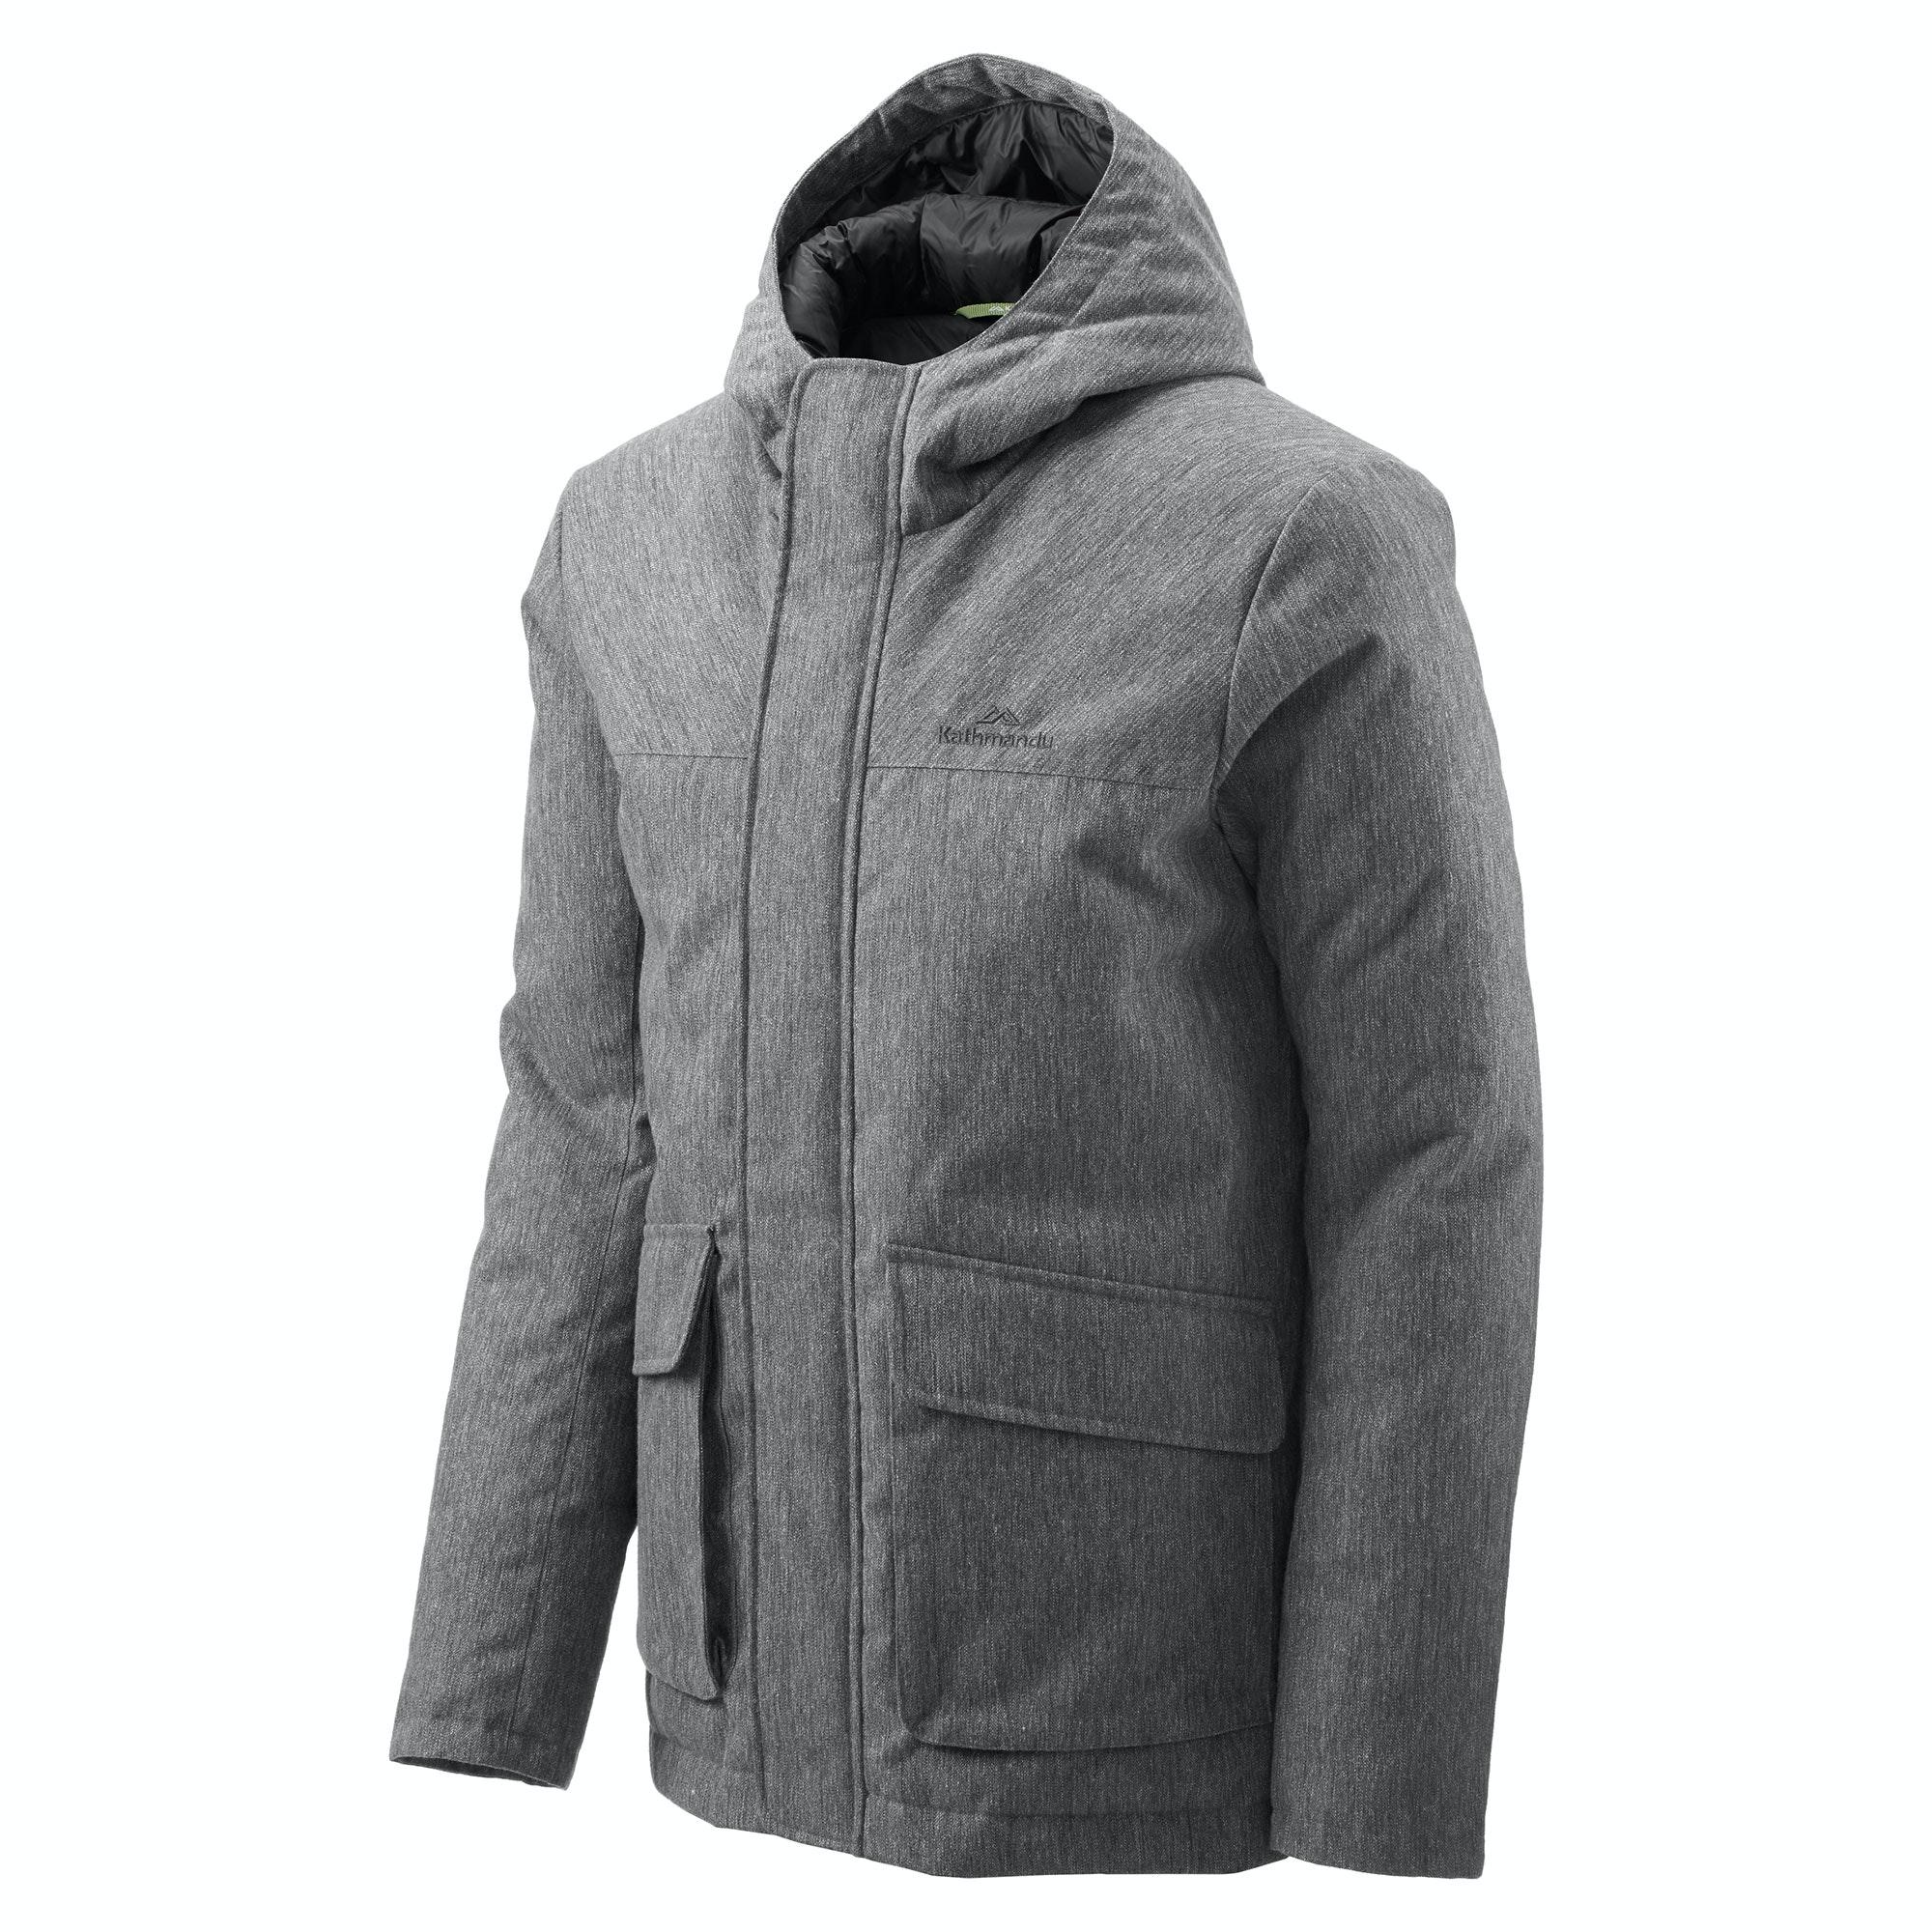 Mens down jacket with hood - New Season Colour